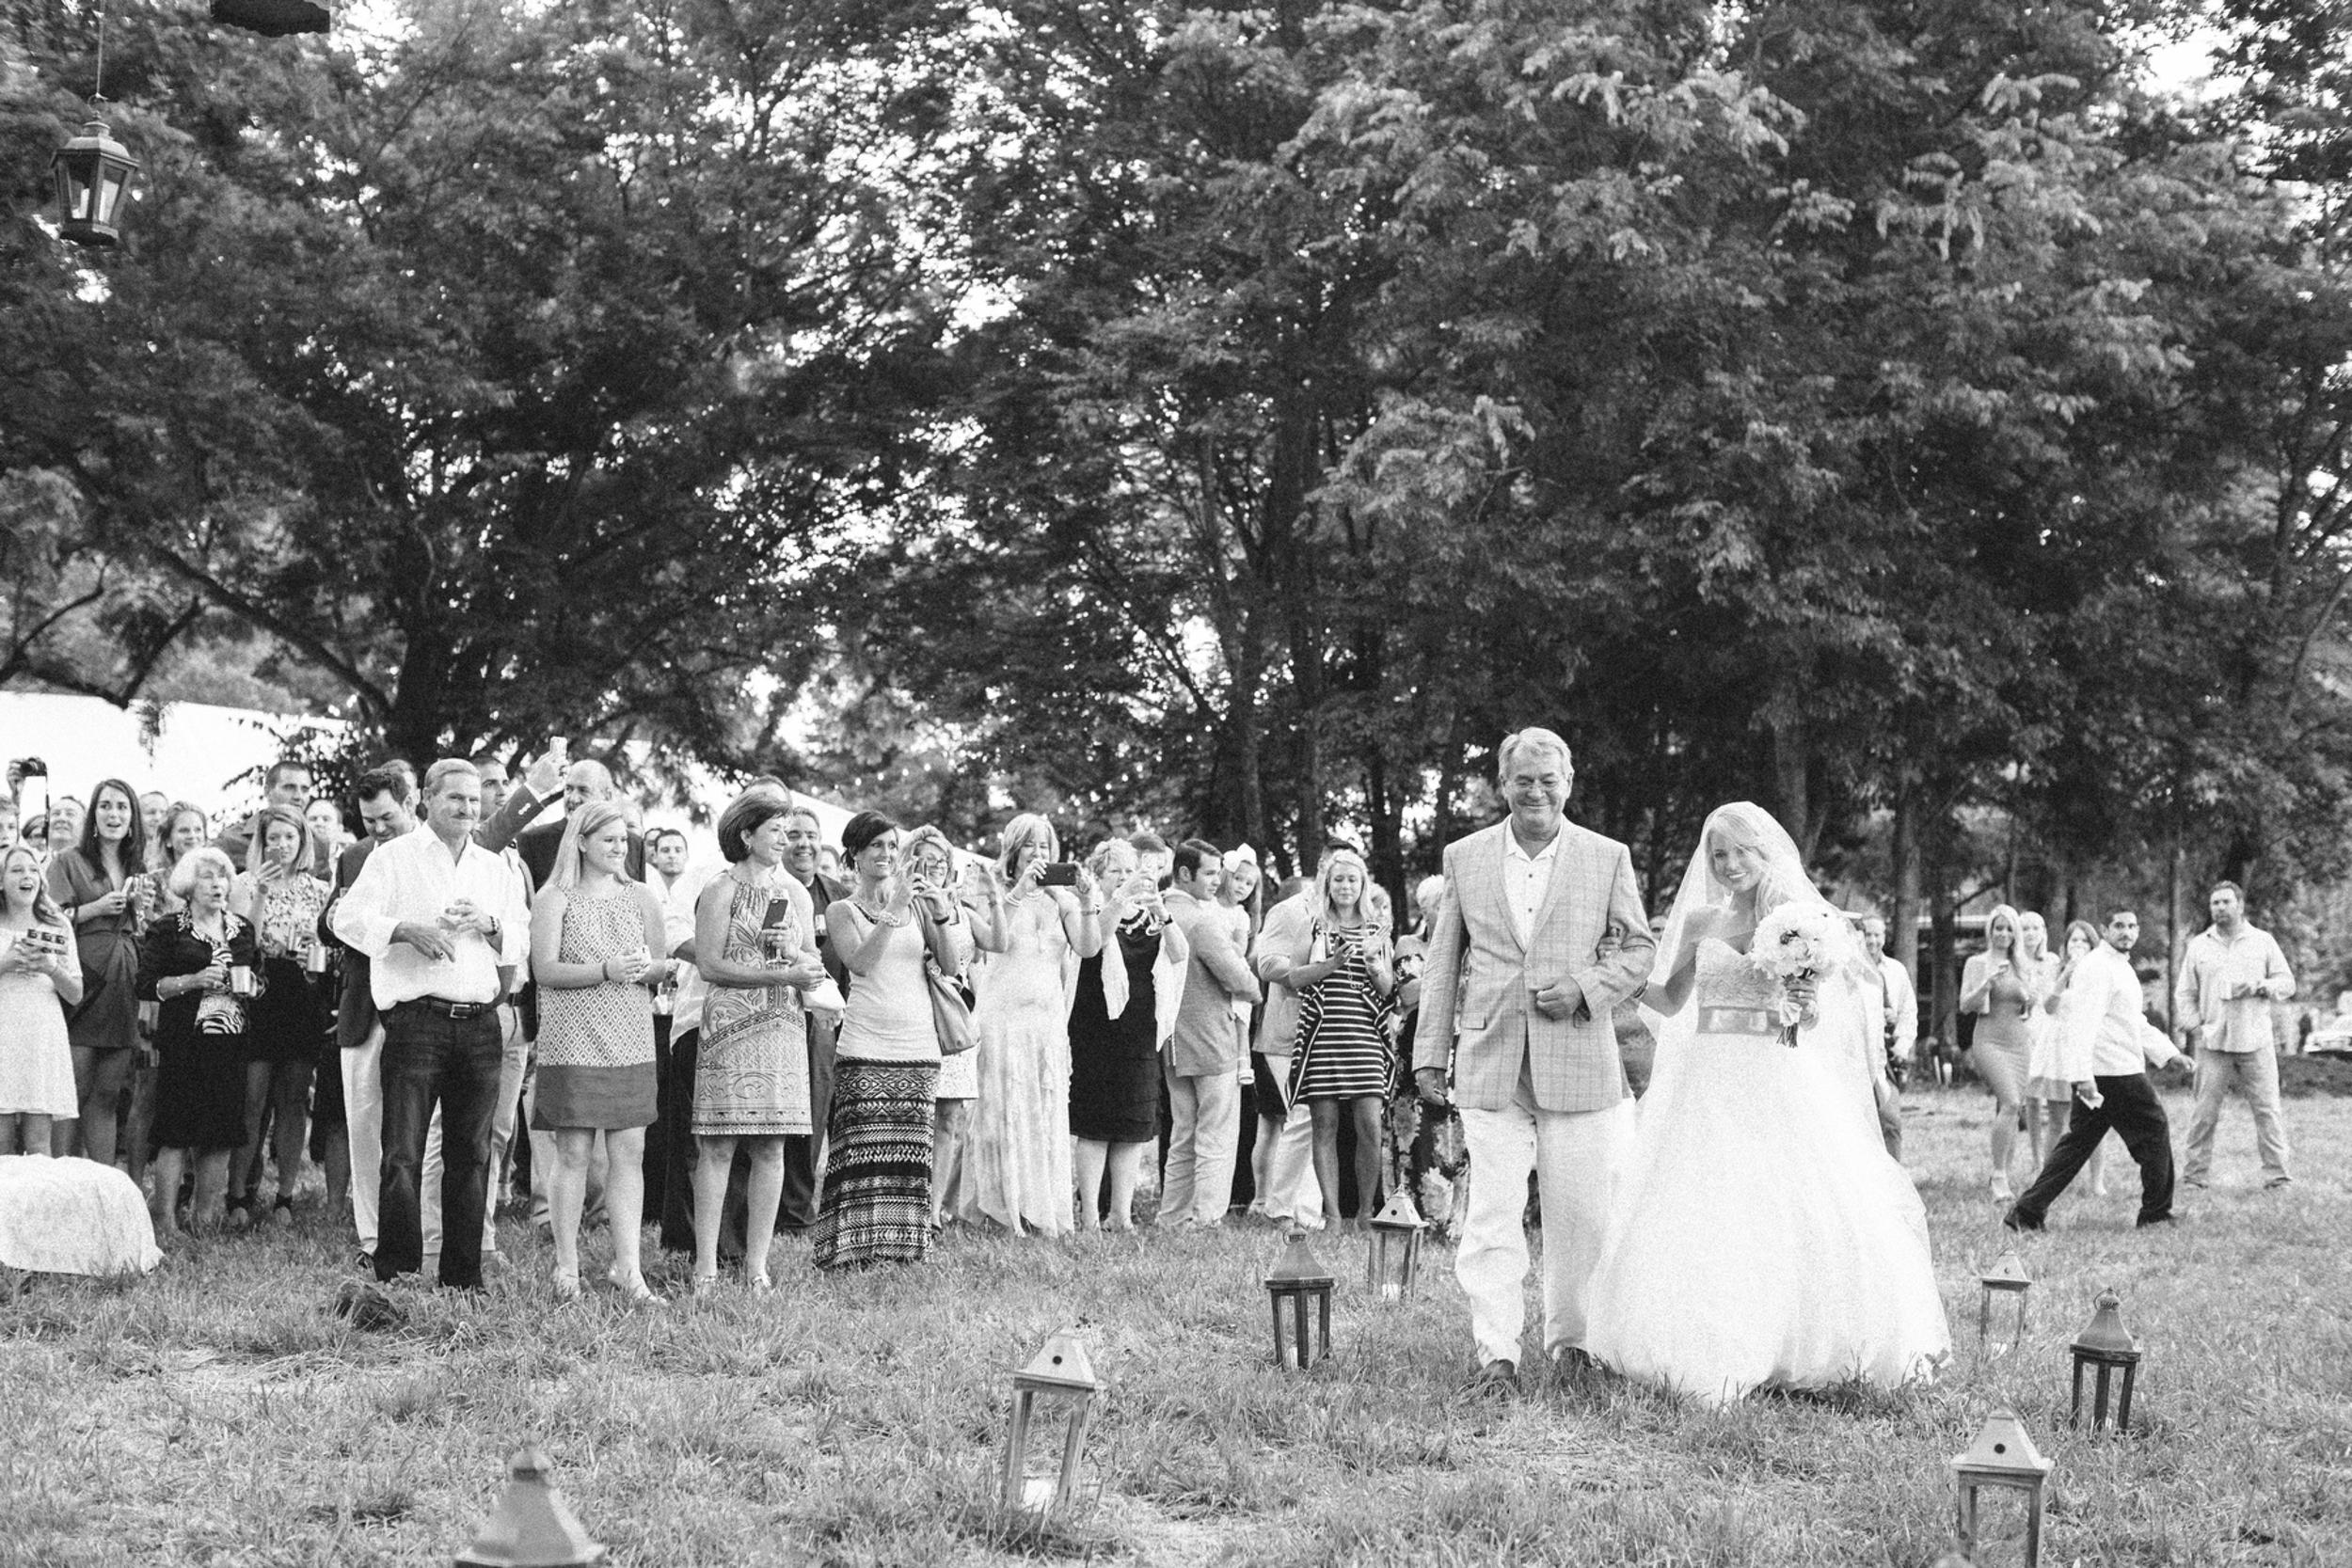 south_carolina_farm_wedding_rustic_chic_surprise_secret_luxe_wedding_bachelorette_emily_maynard_real_weddings-25.jpg